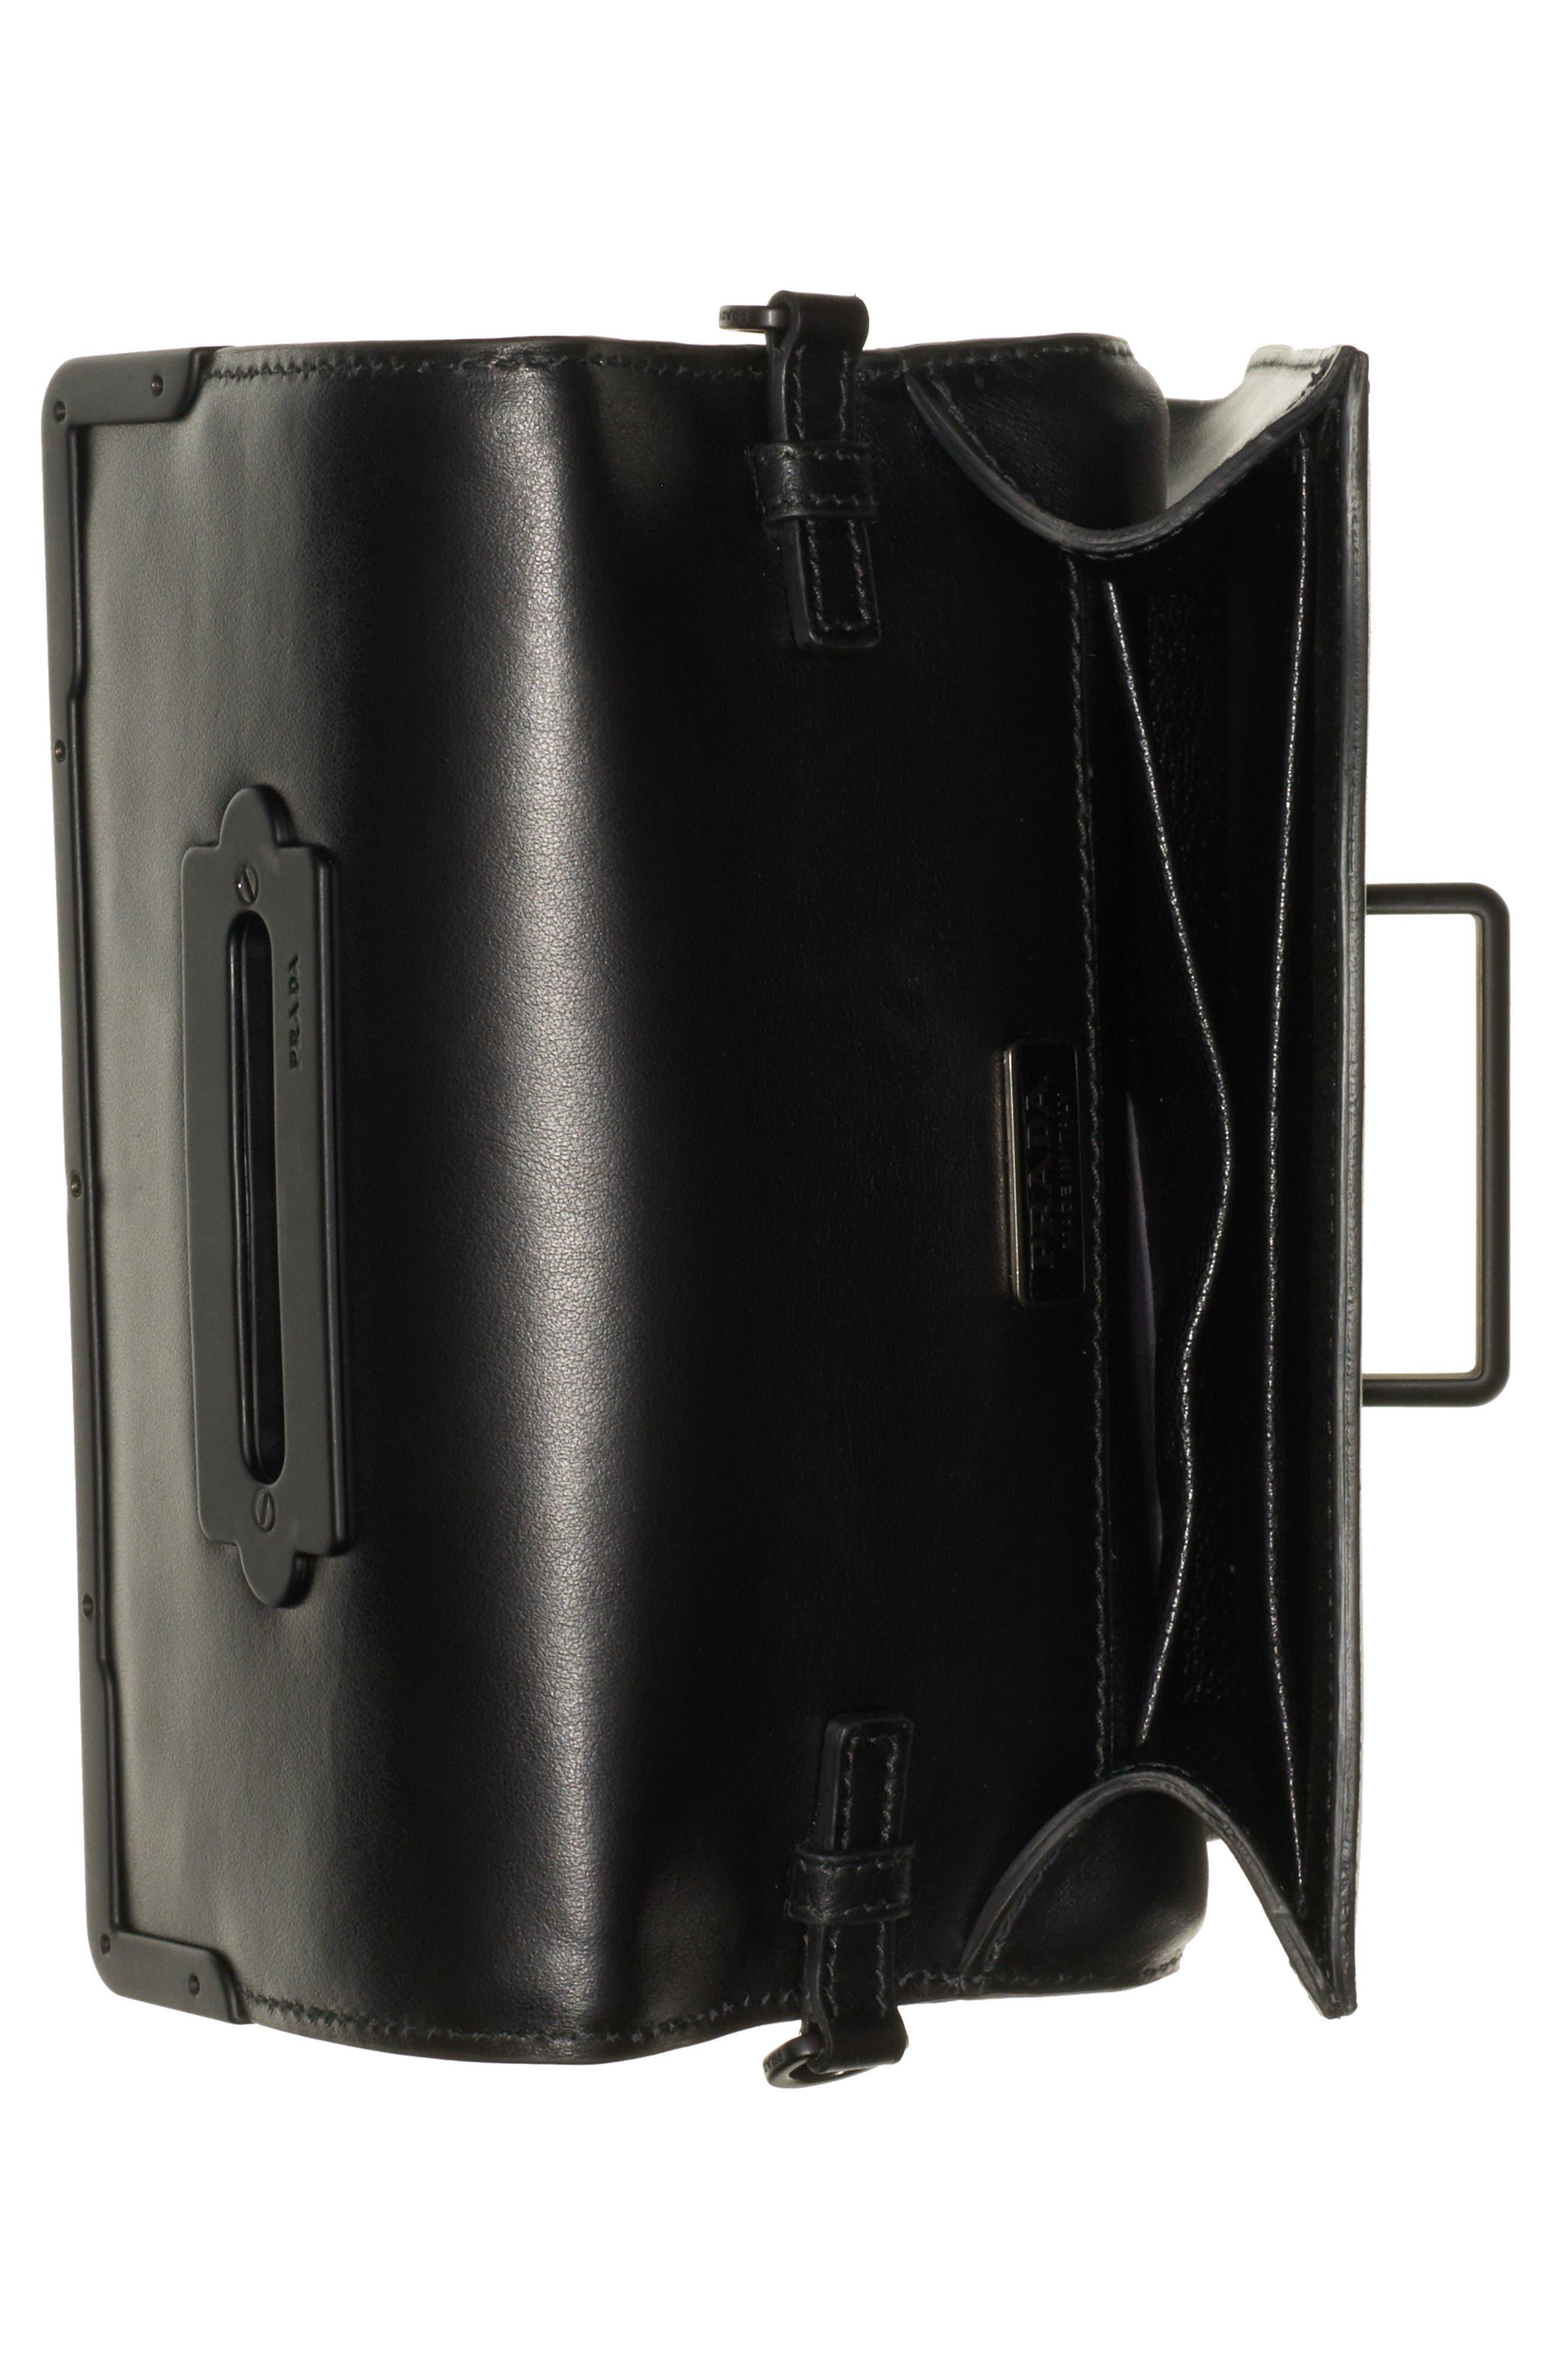 PRADA,                             Cahier Studded Leather Crossbody Bag,                             Alternate thumbnail 3, color,                             NERO/ NERO